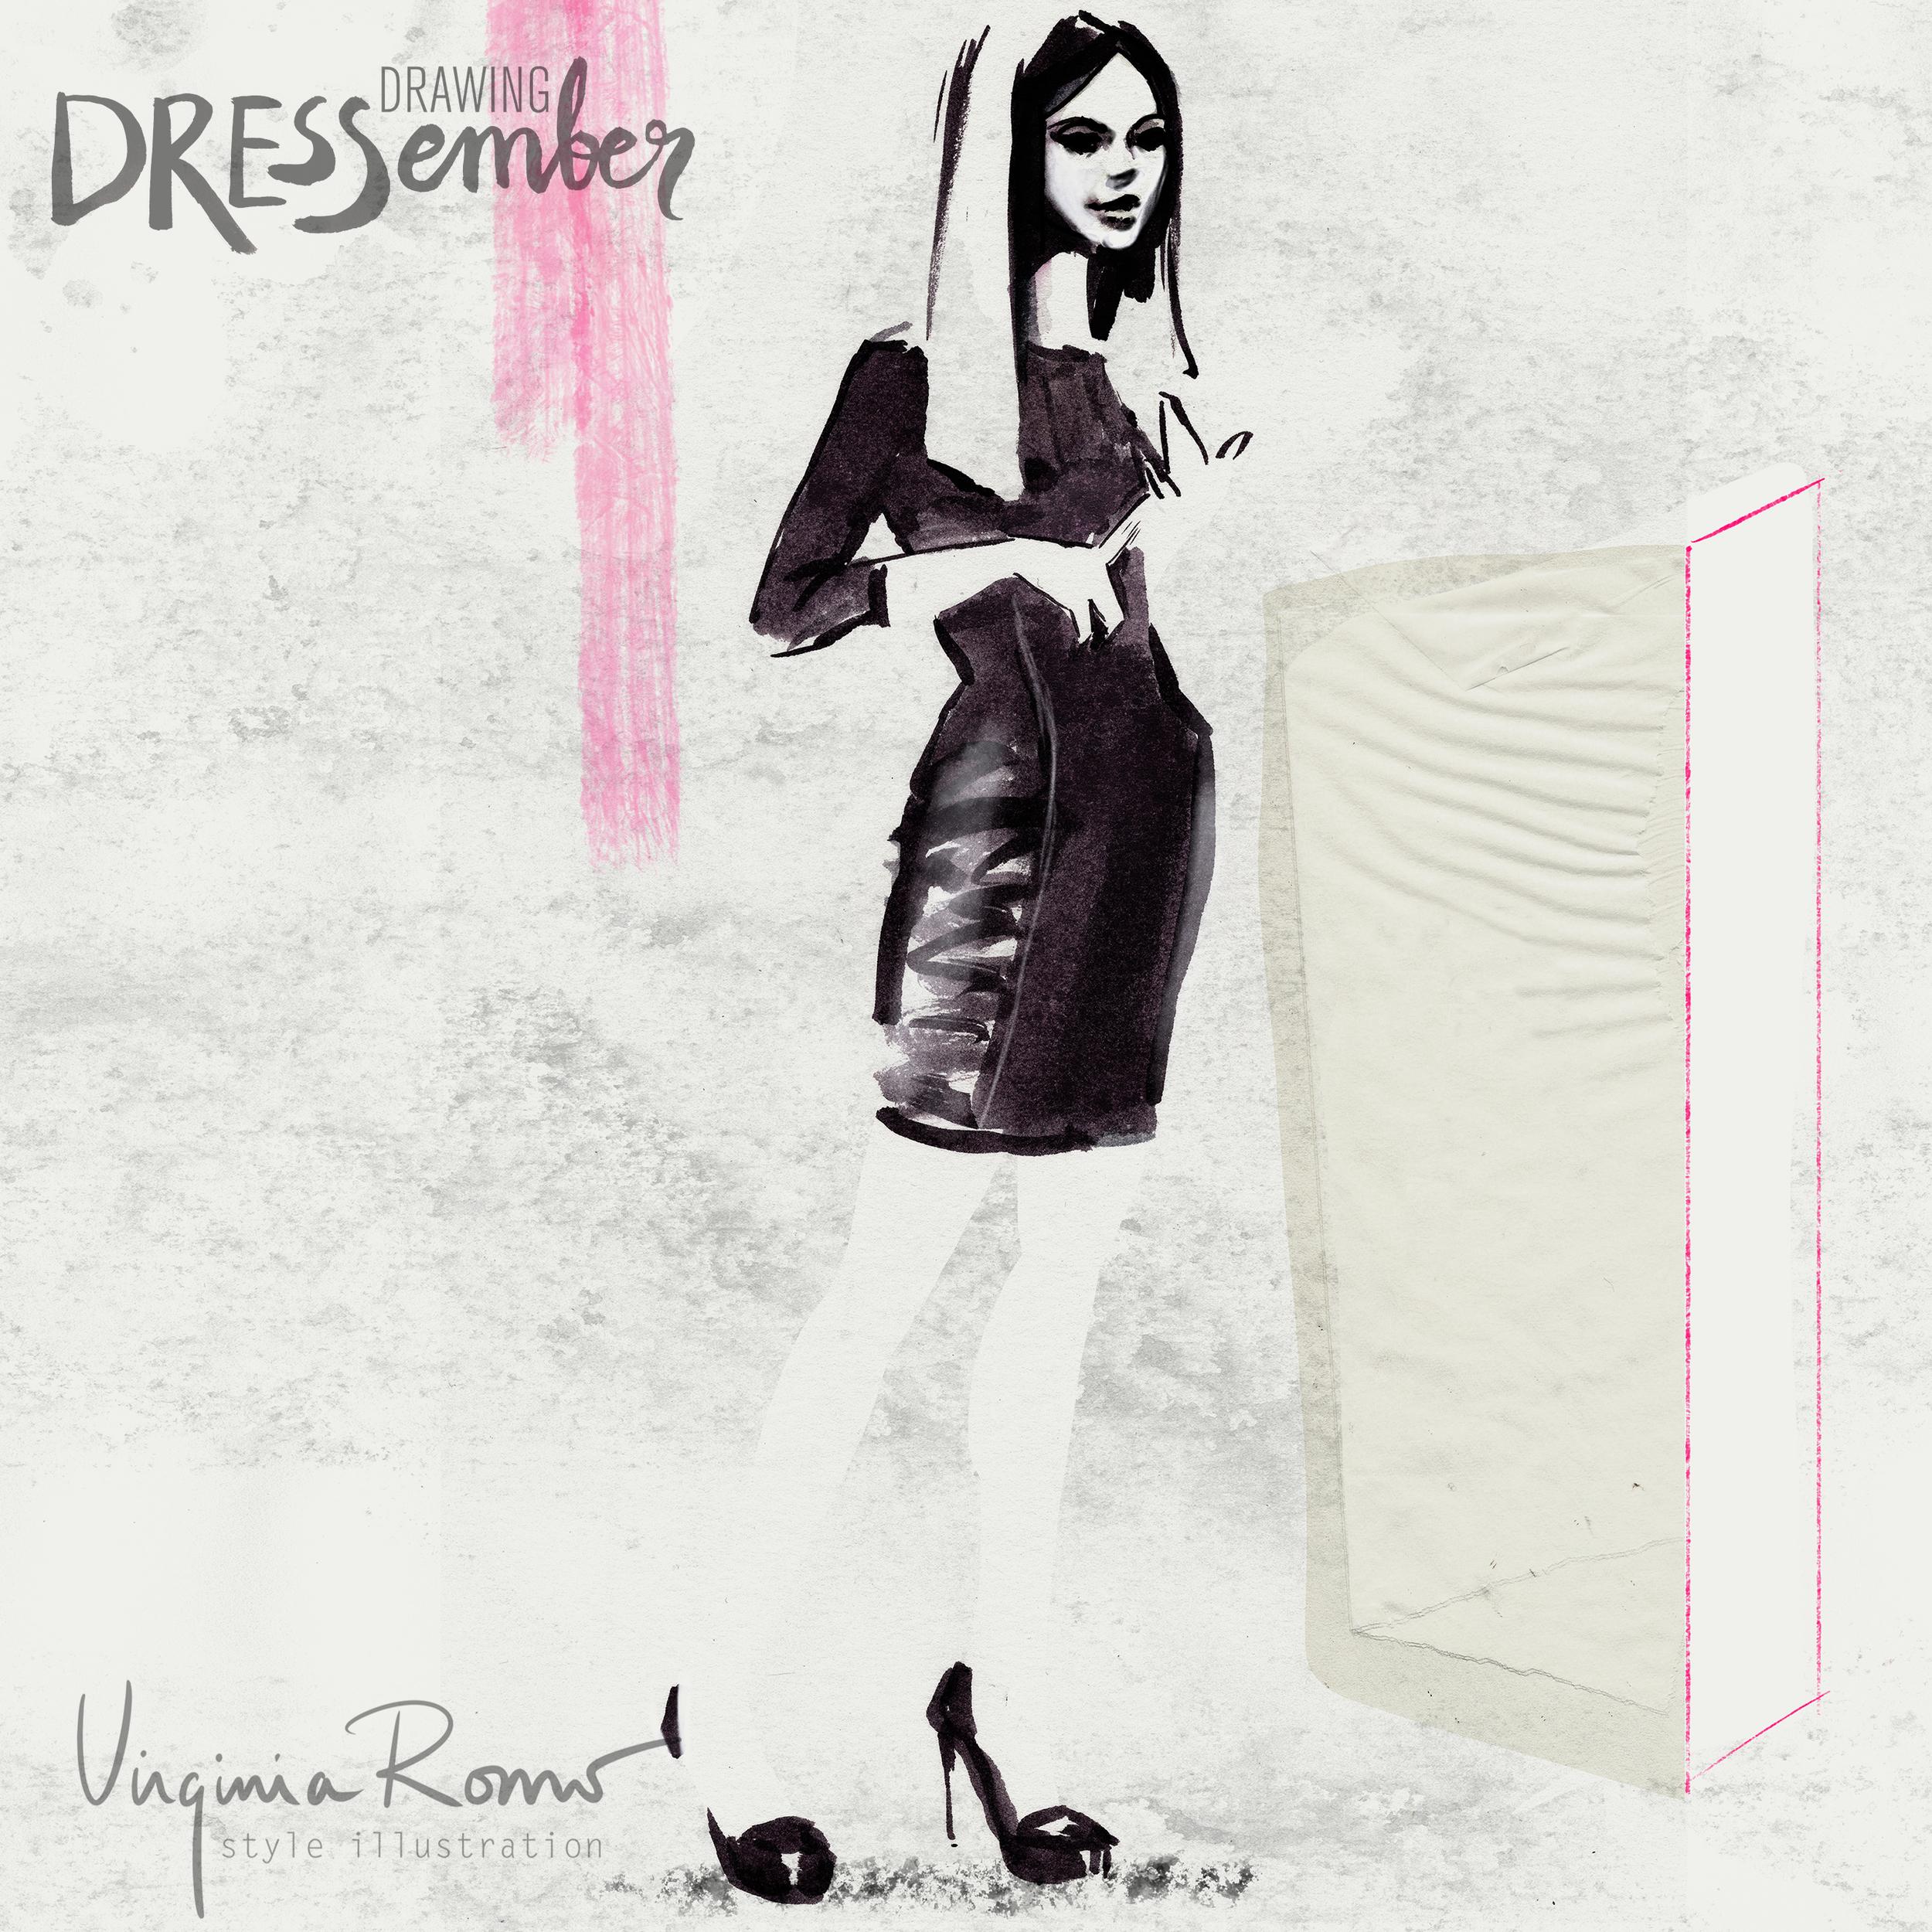 dressember-VirginiaRomoIllustration-00-Sunny-IG2.jpg